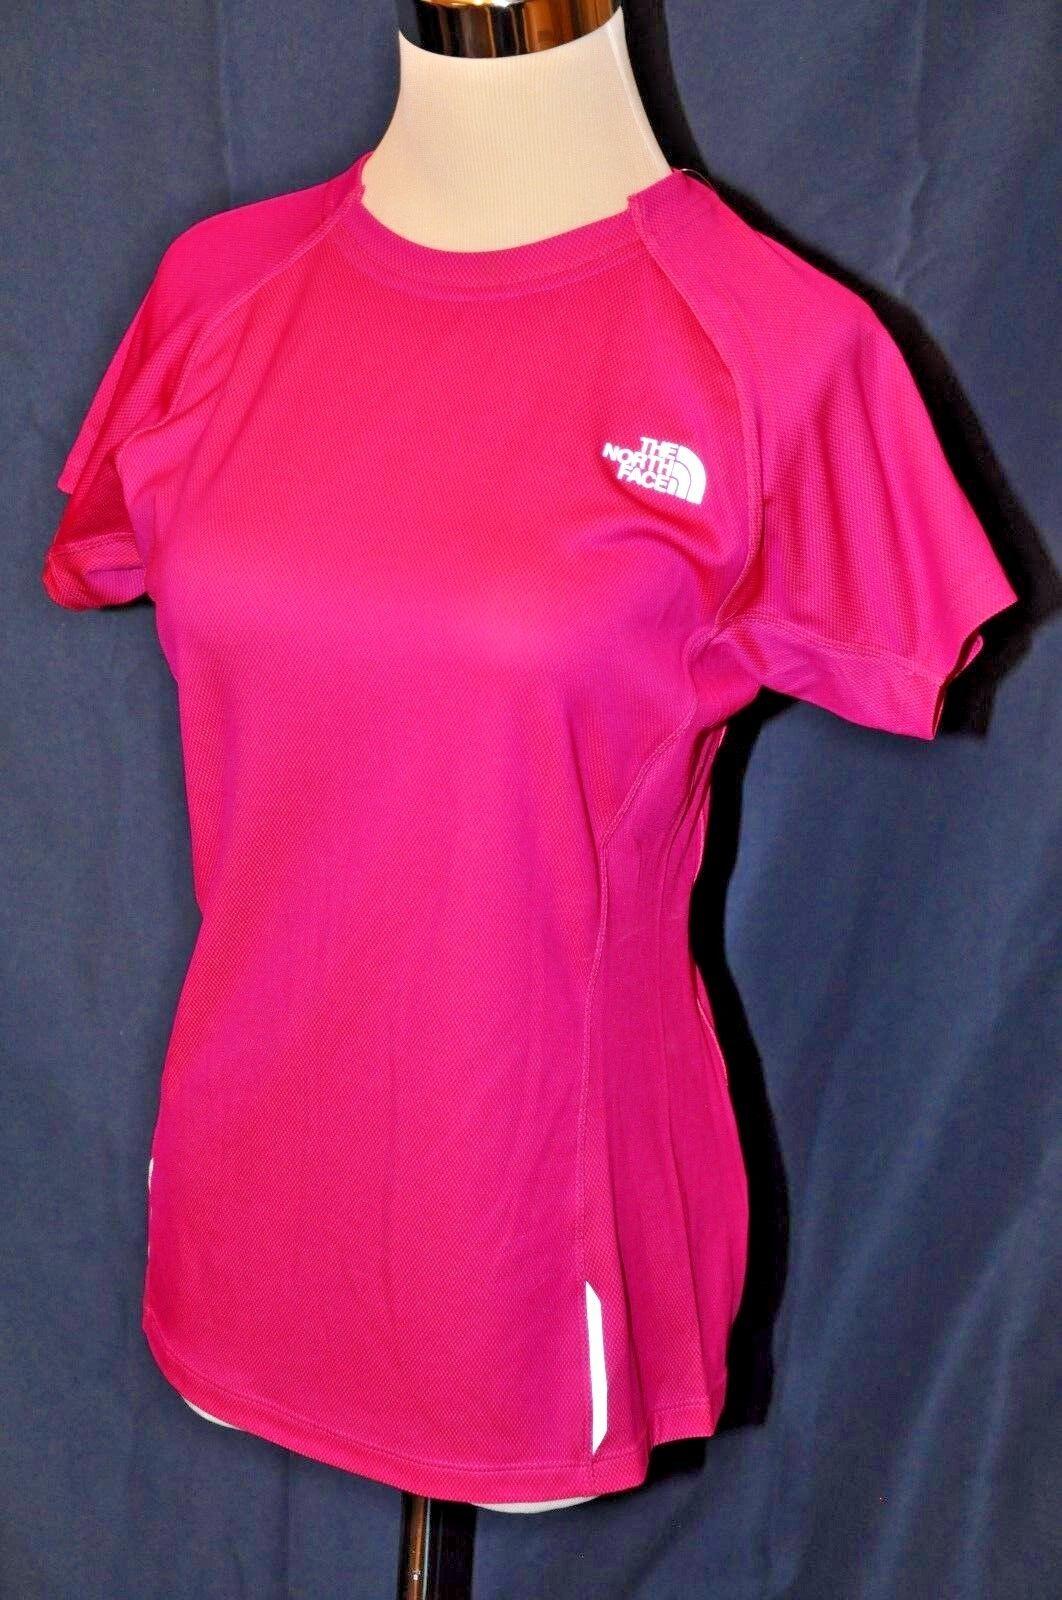 The North Face shirt top short Sleeve New  60 M Luminous pink running reflective